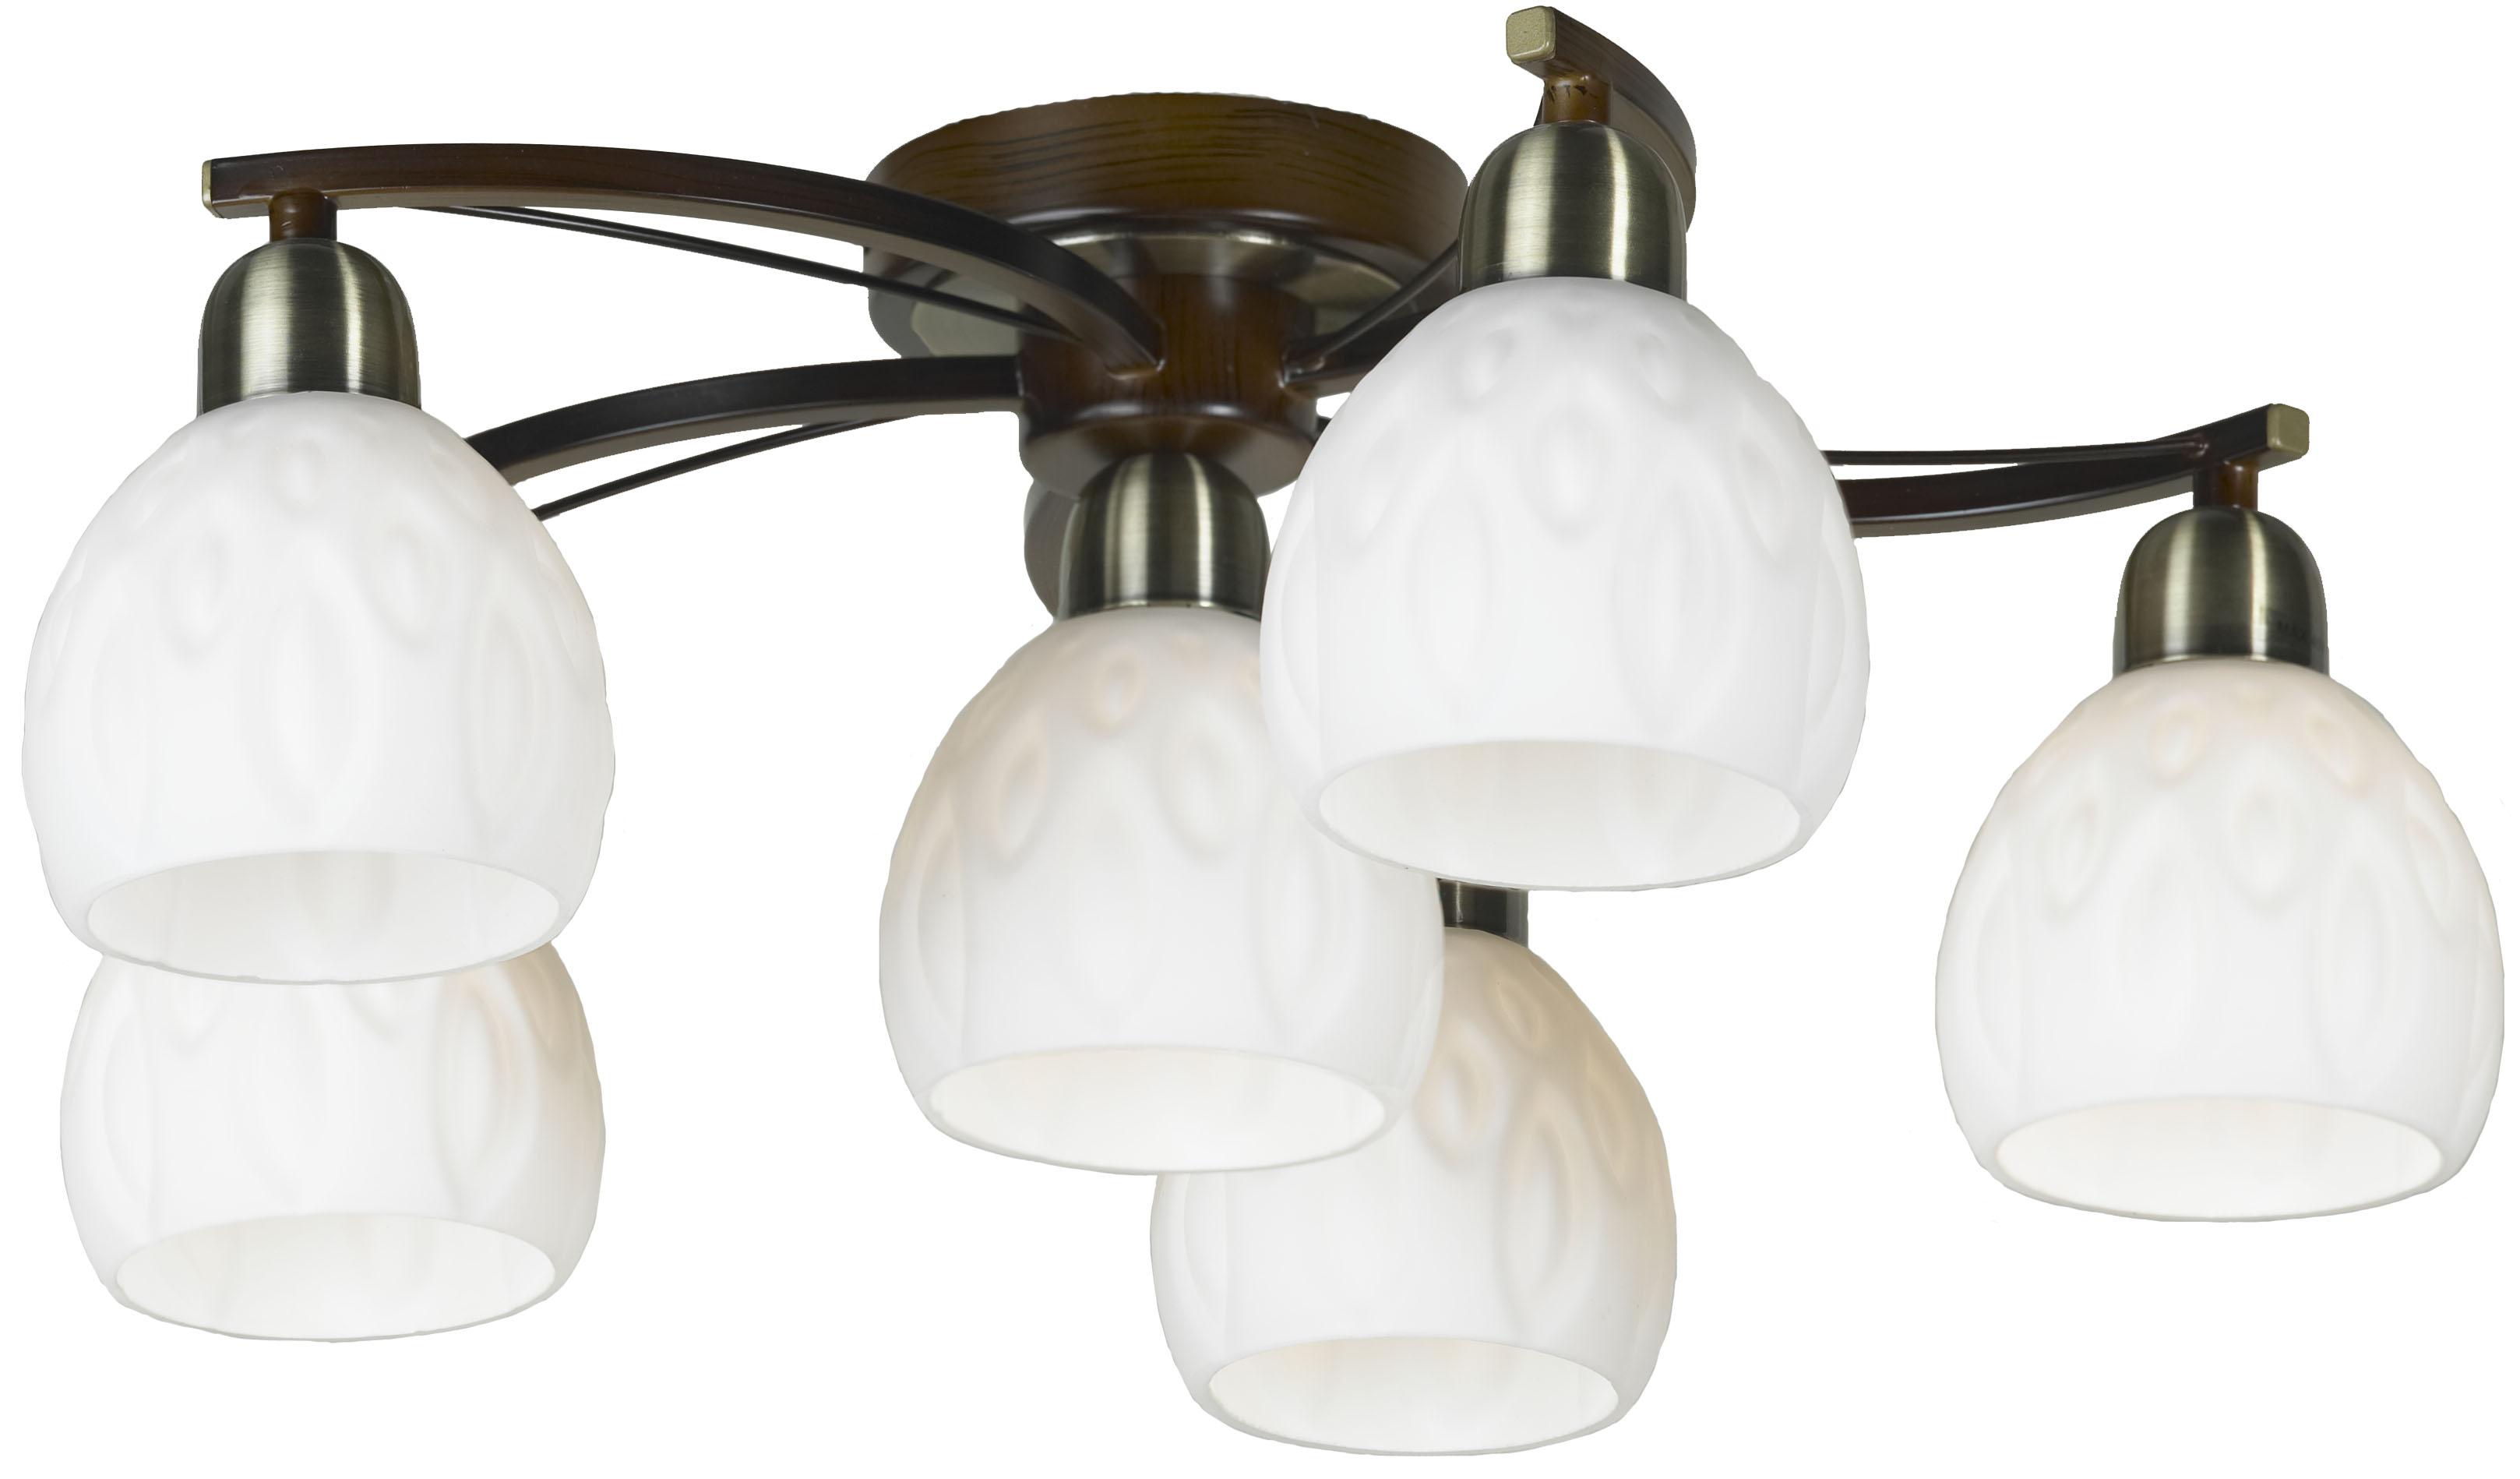 Люстра LussoleЛюстры<br>Назначение светильника: для комнаты,<br>Стиль светильника: модерн,<br>Тип: потолочная,<br>Материал светильника: металл, стекло,<br>Материал плафона: стекло,<br>Материал арматуры: металл,<br>Длина (мм): 200,<br>Ширина: 520,<br>Количество ламп: 6,<br>Тип лампы: накаливания,<br>Мощность: 40,<br>Патрон: Е14,<br>Цвет арматуры: бронза<br>